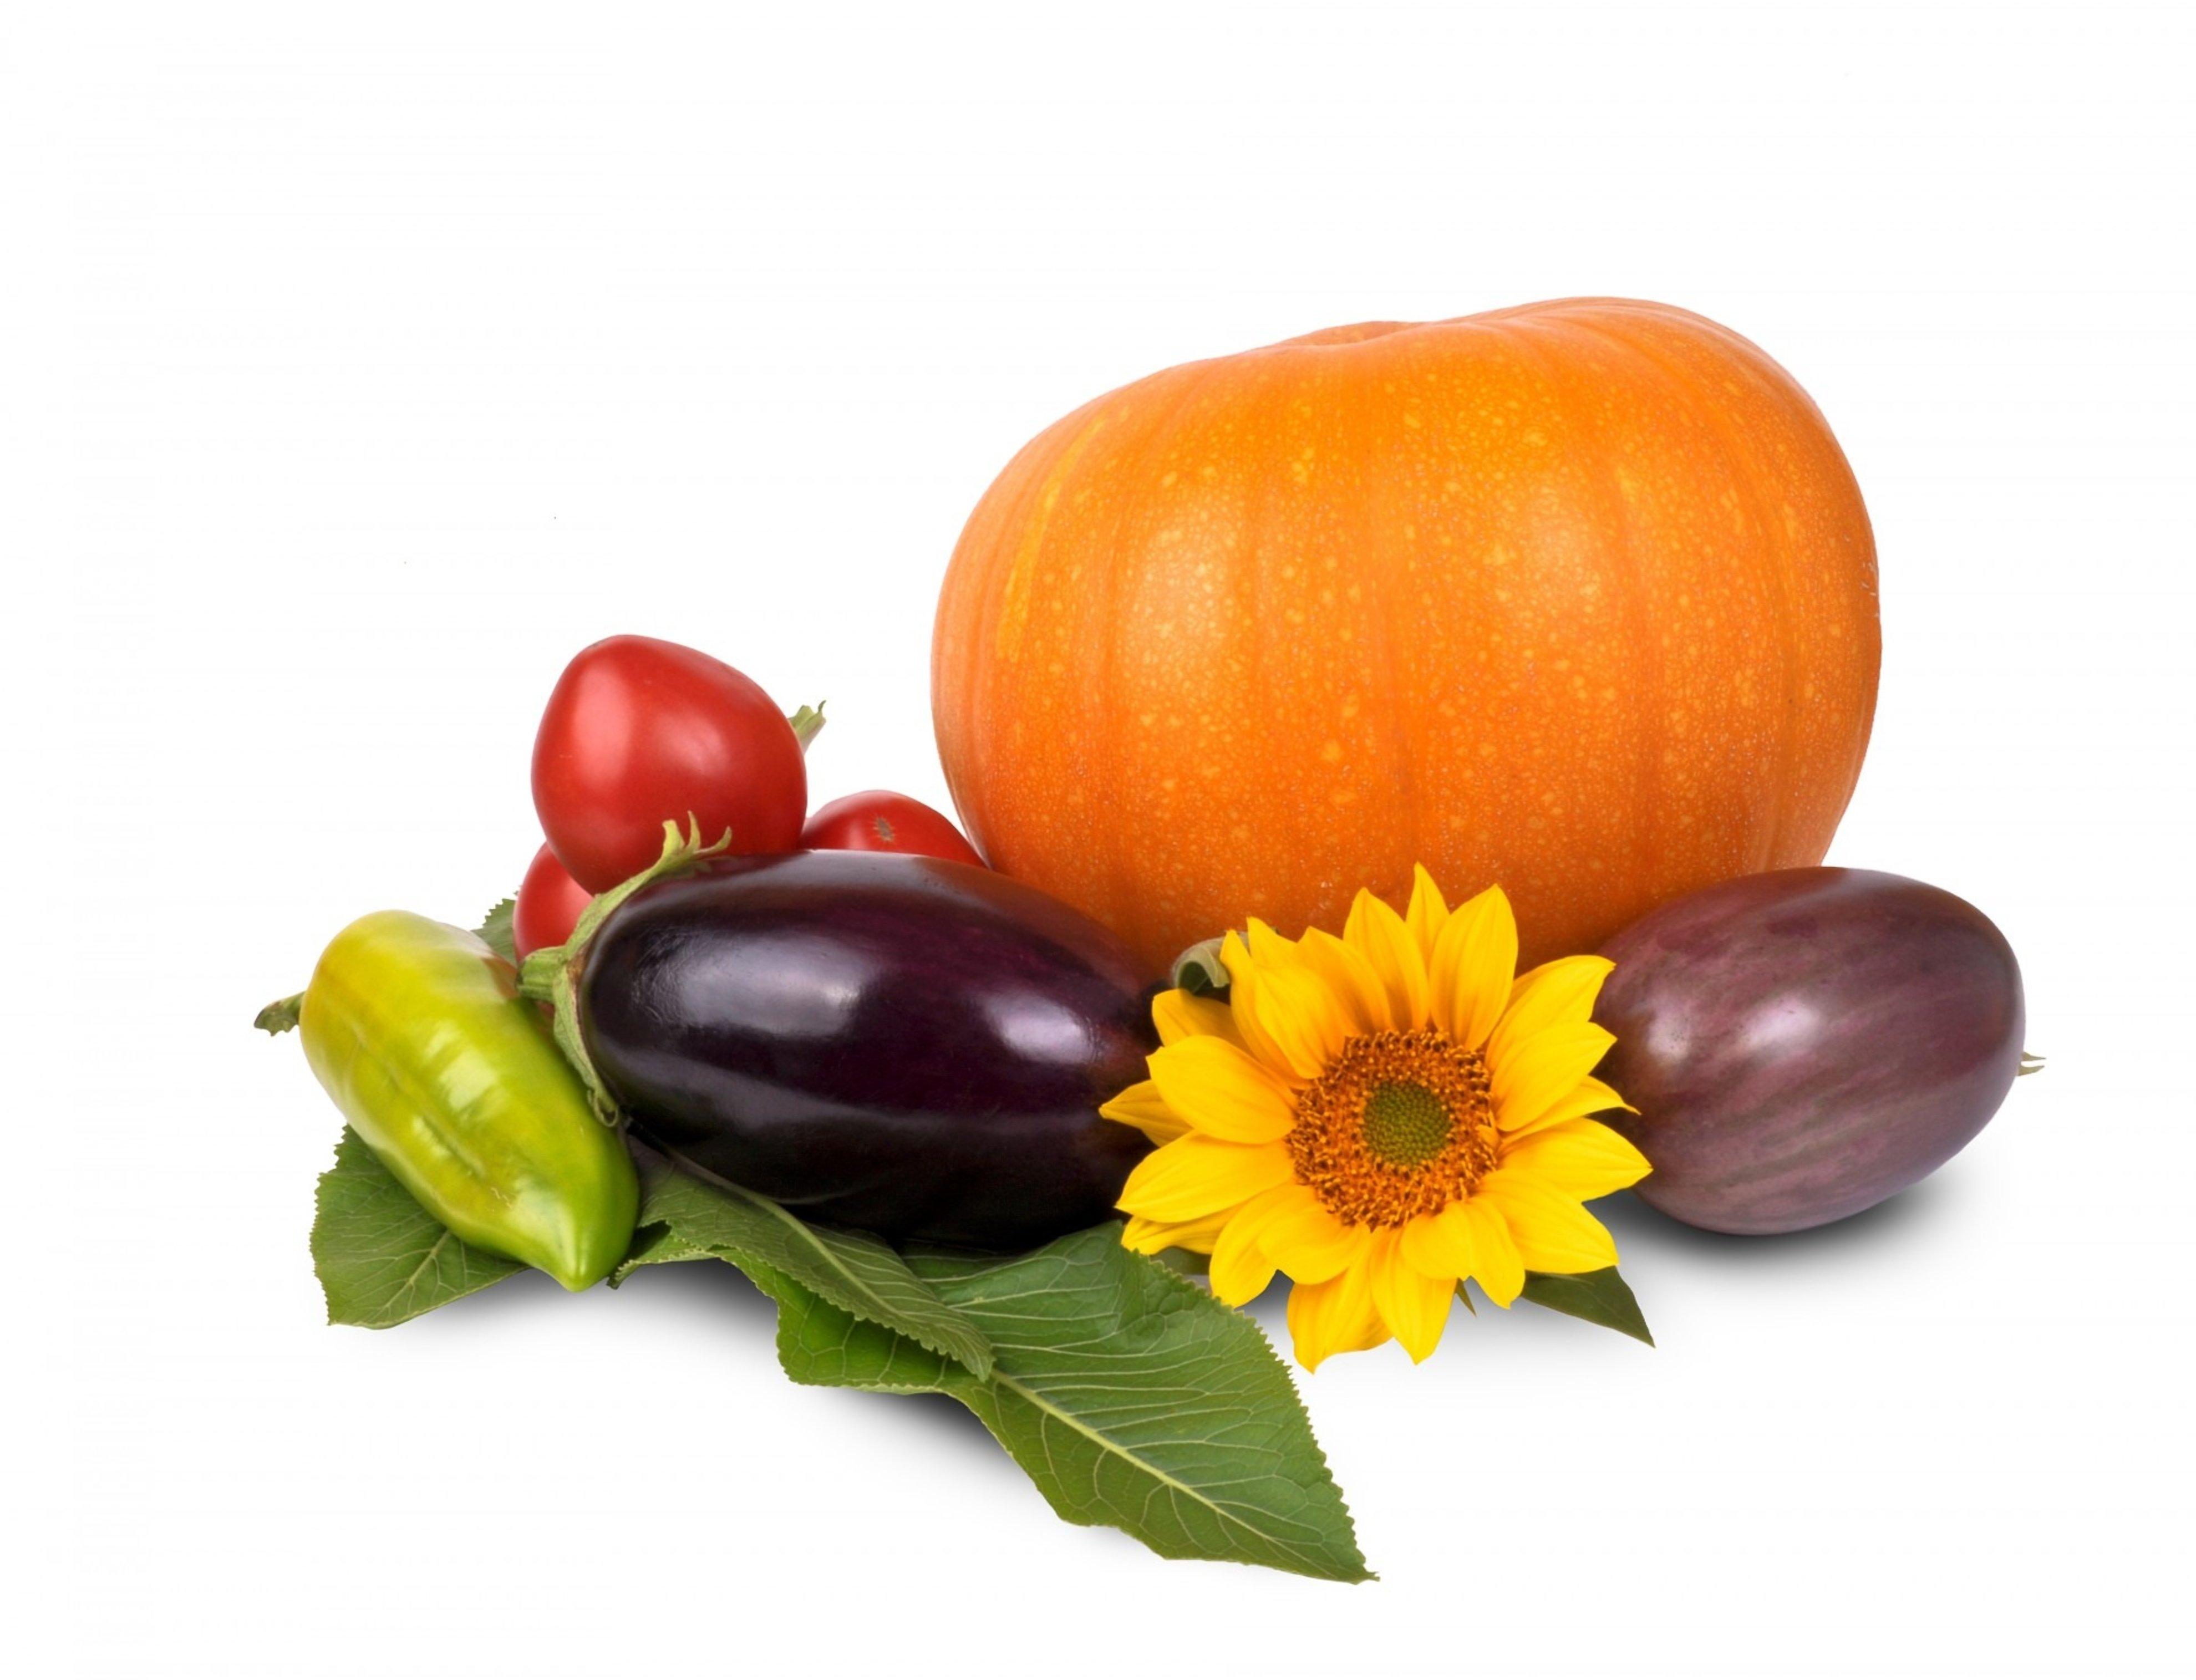 Top foods to enjoy this autumn